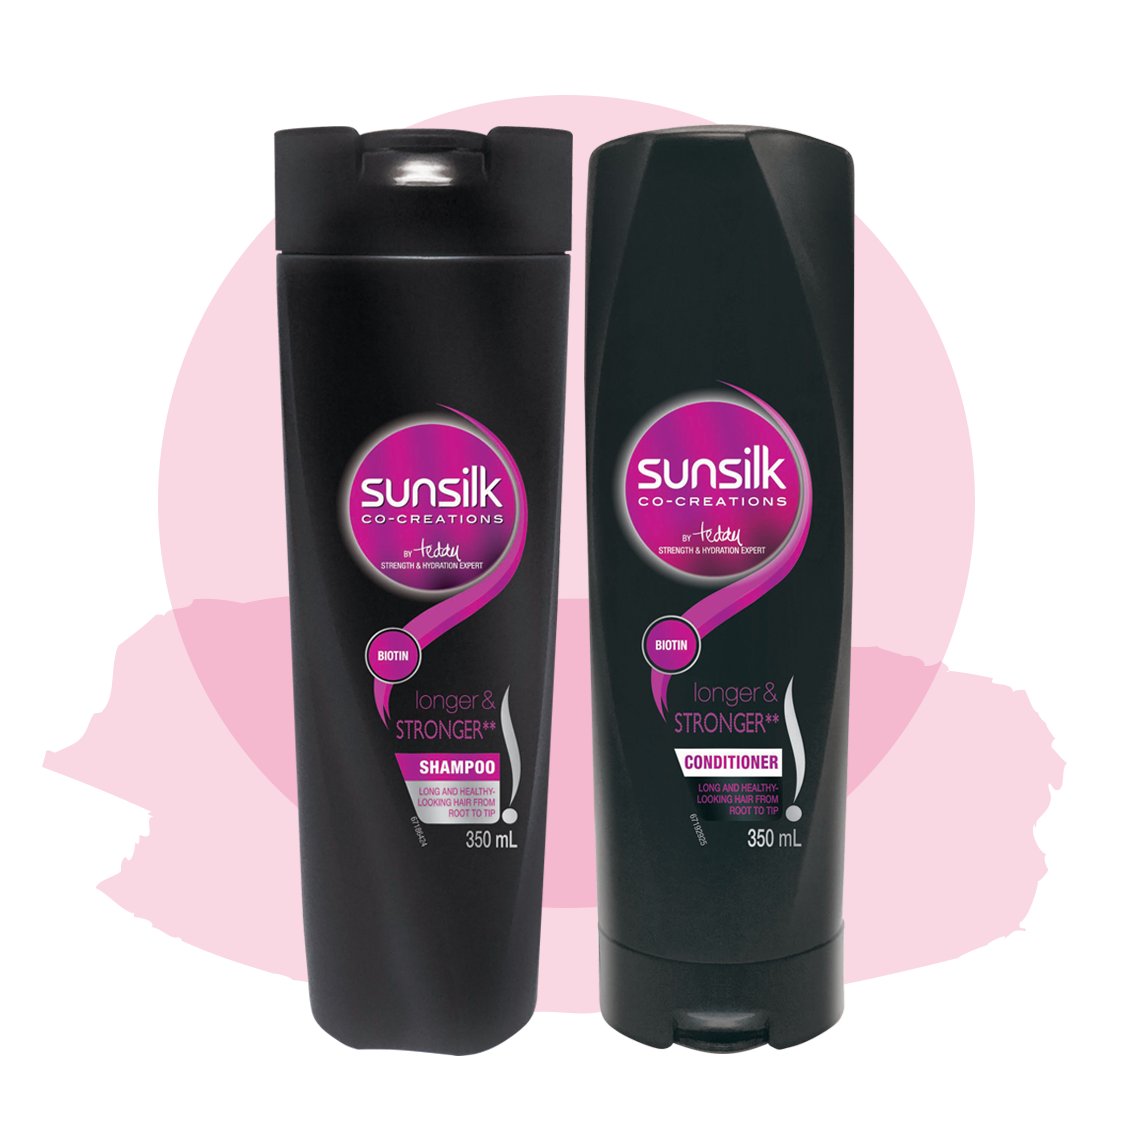 marketing plan of sunsilk shampoo 1current marketing situation axe, dove, rexona, sunsilk, wheel, rafhan, surf excel, comfort marketing plan: surf excel.